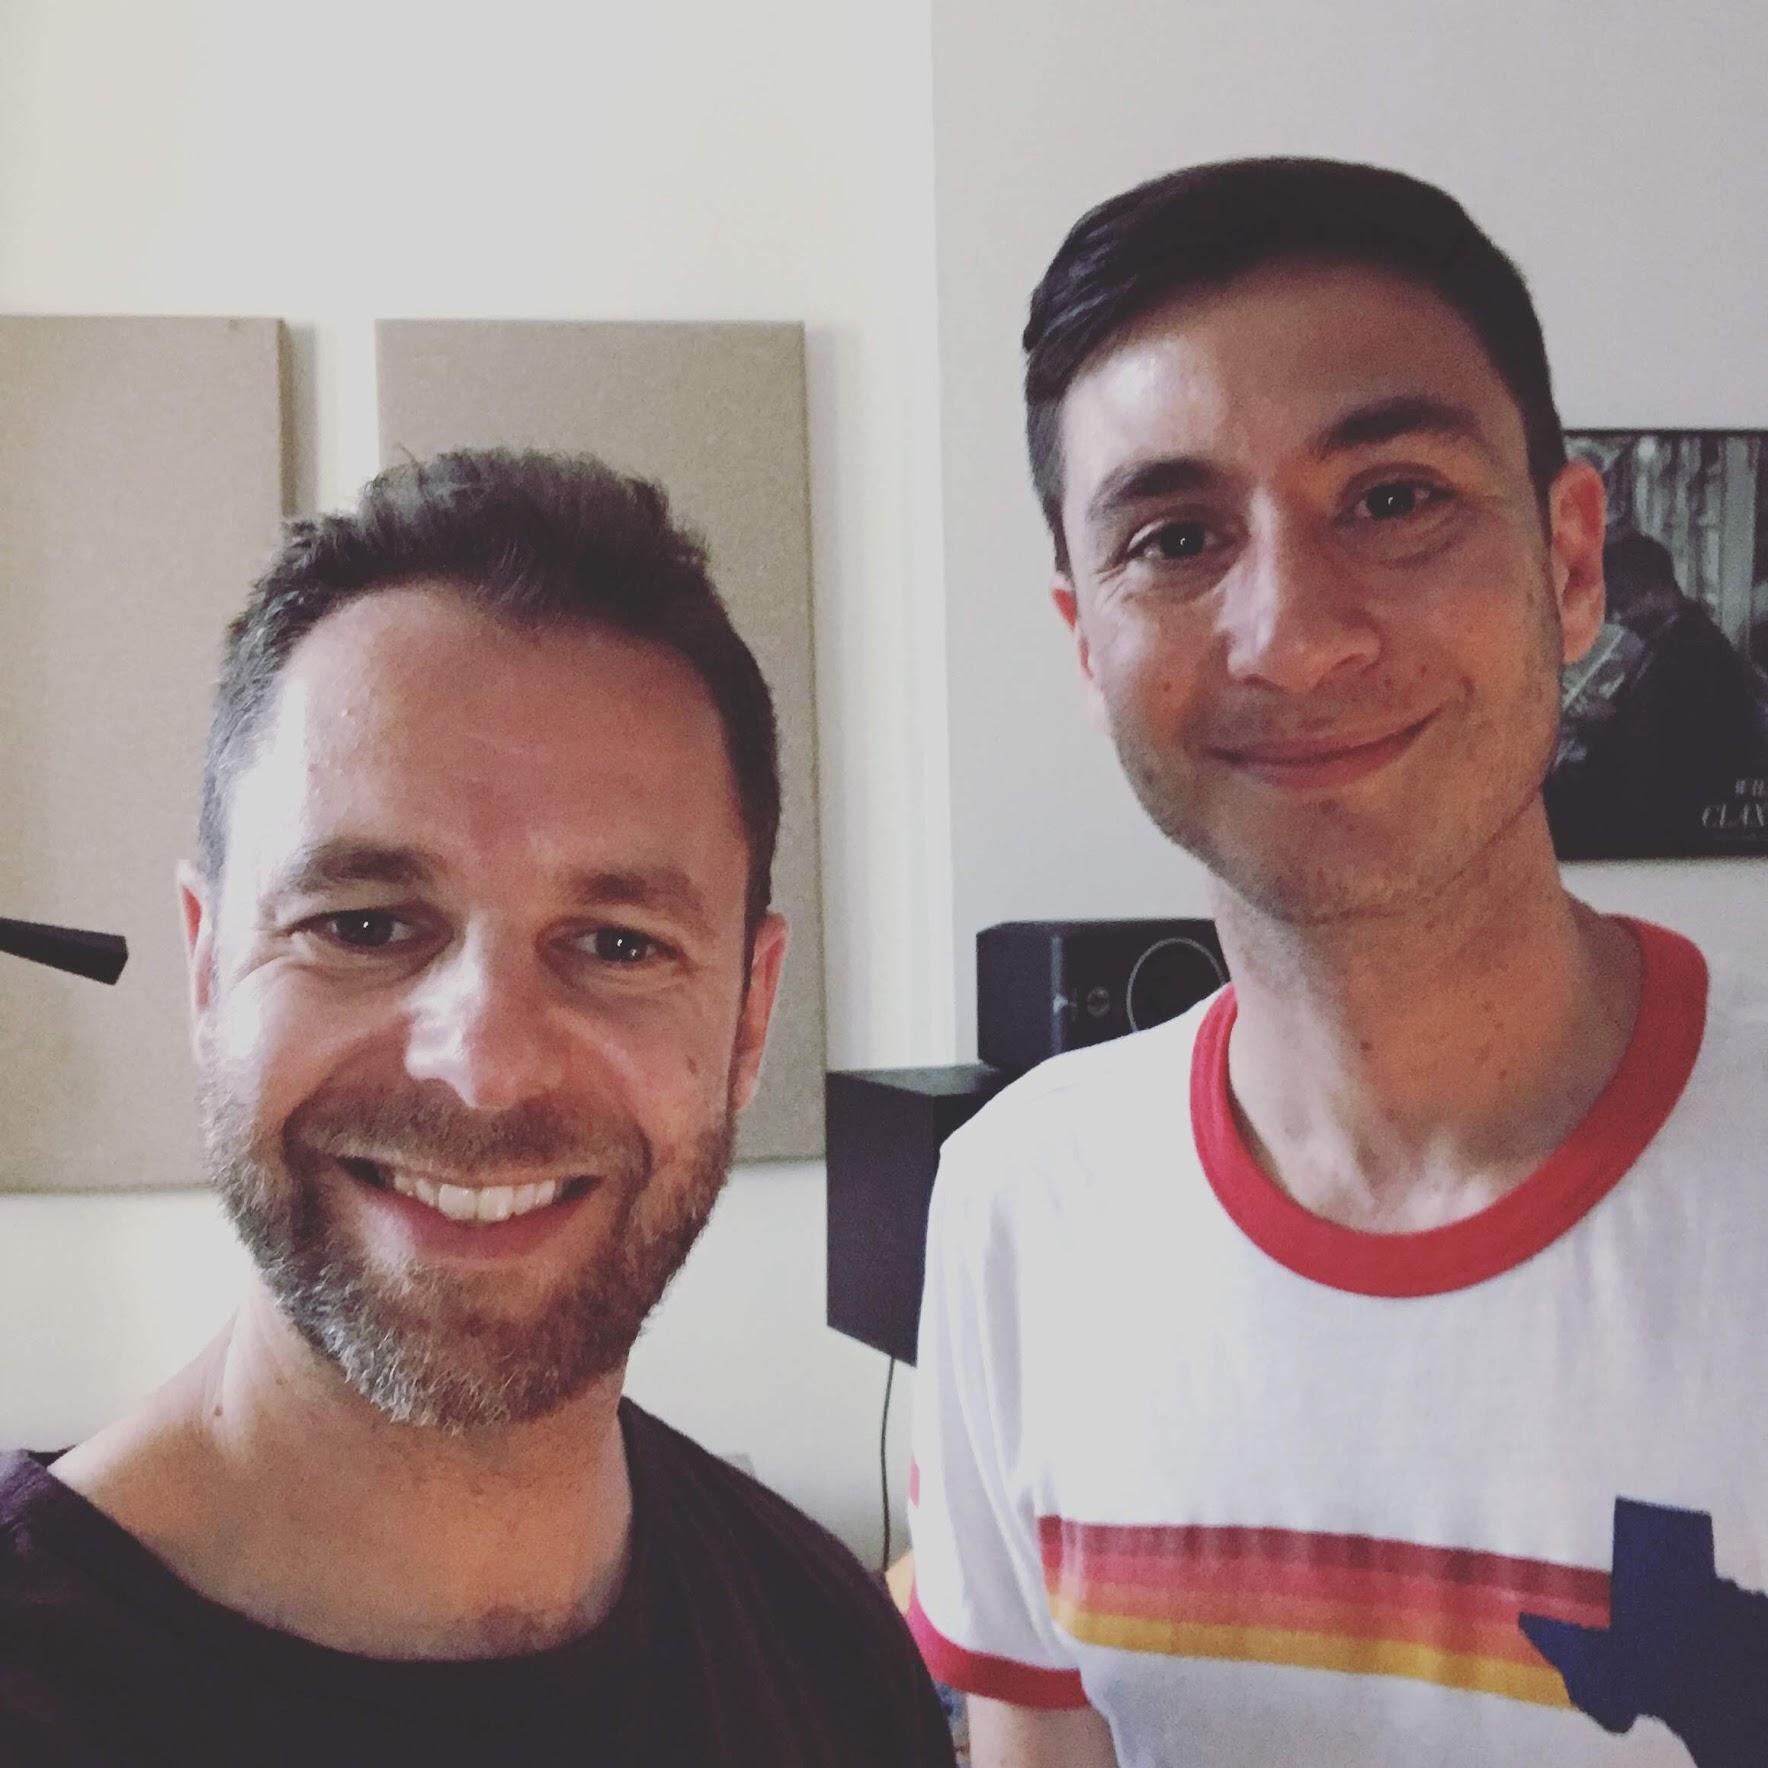 With Joey Dosik, Brooklyn, June 2019